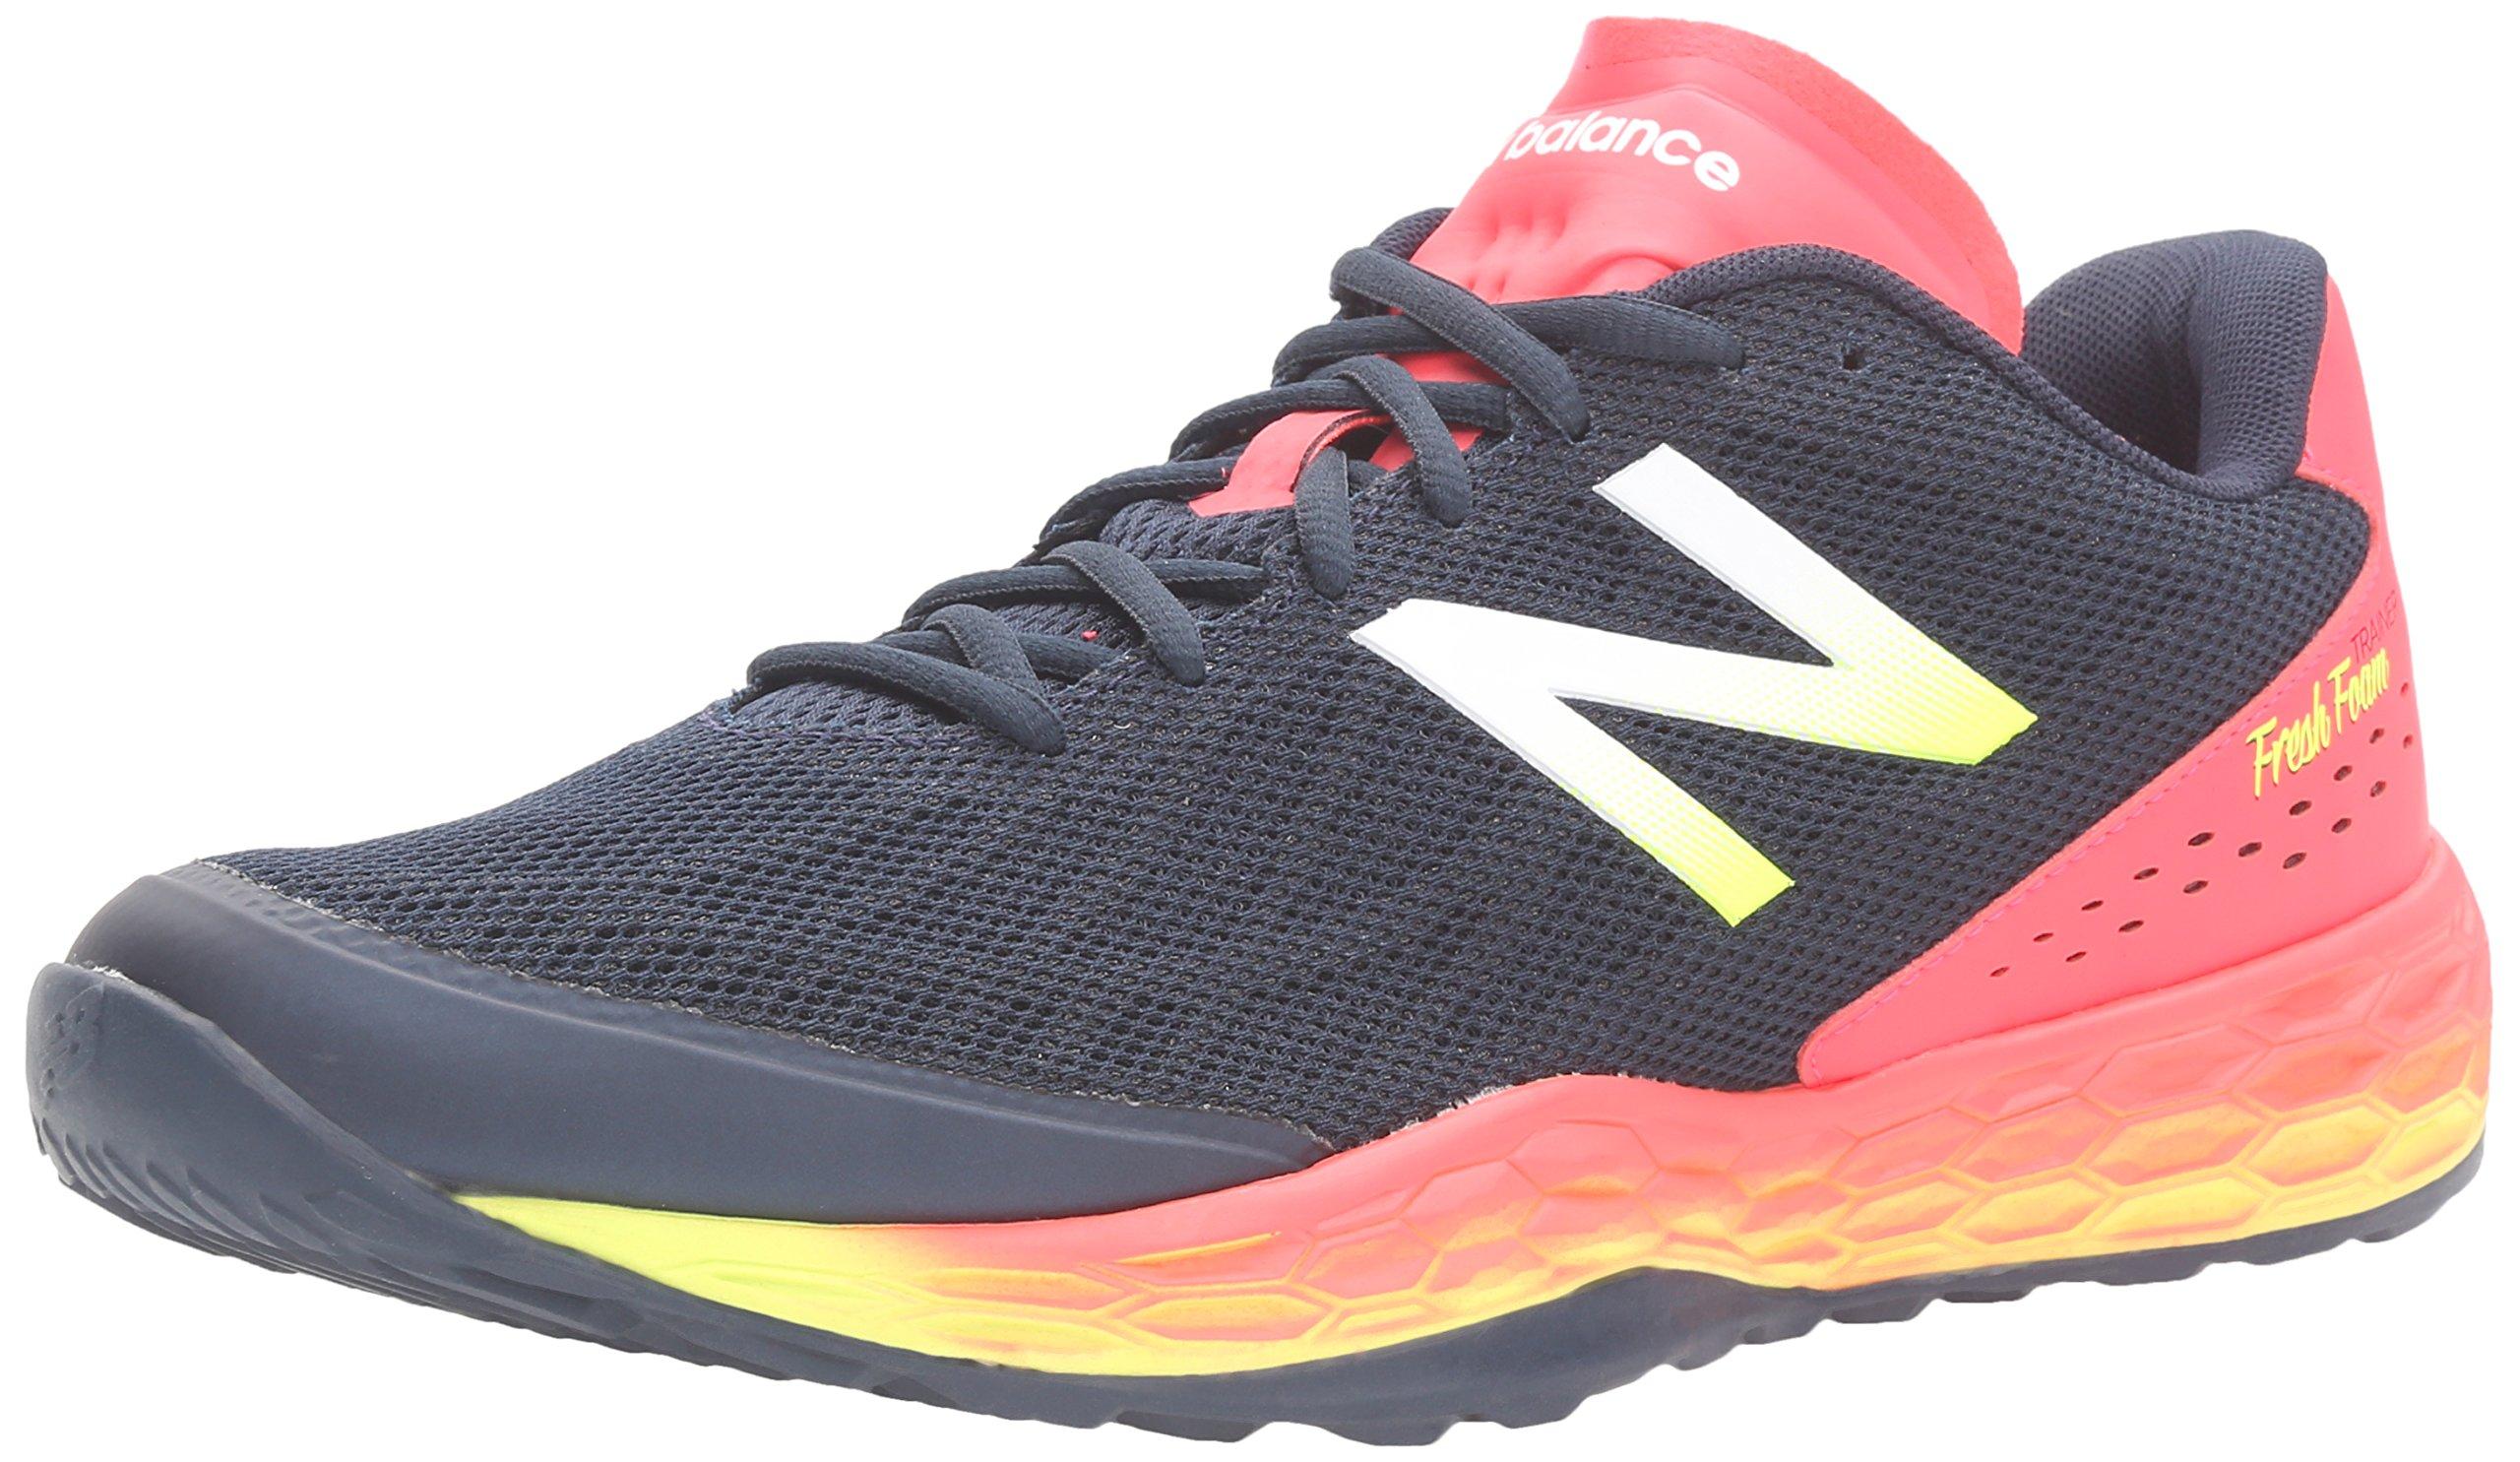 New Balance Men's Mx80 Athletic Sandals